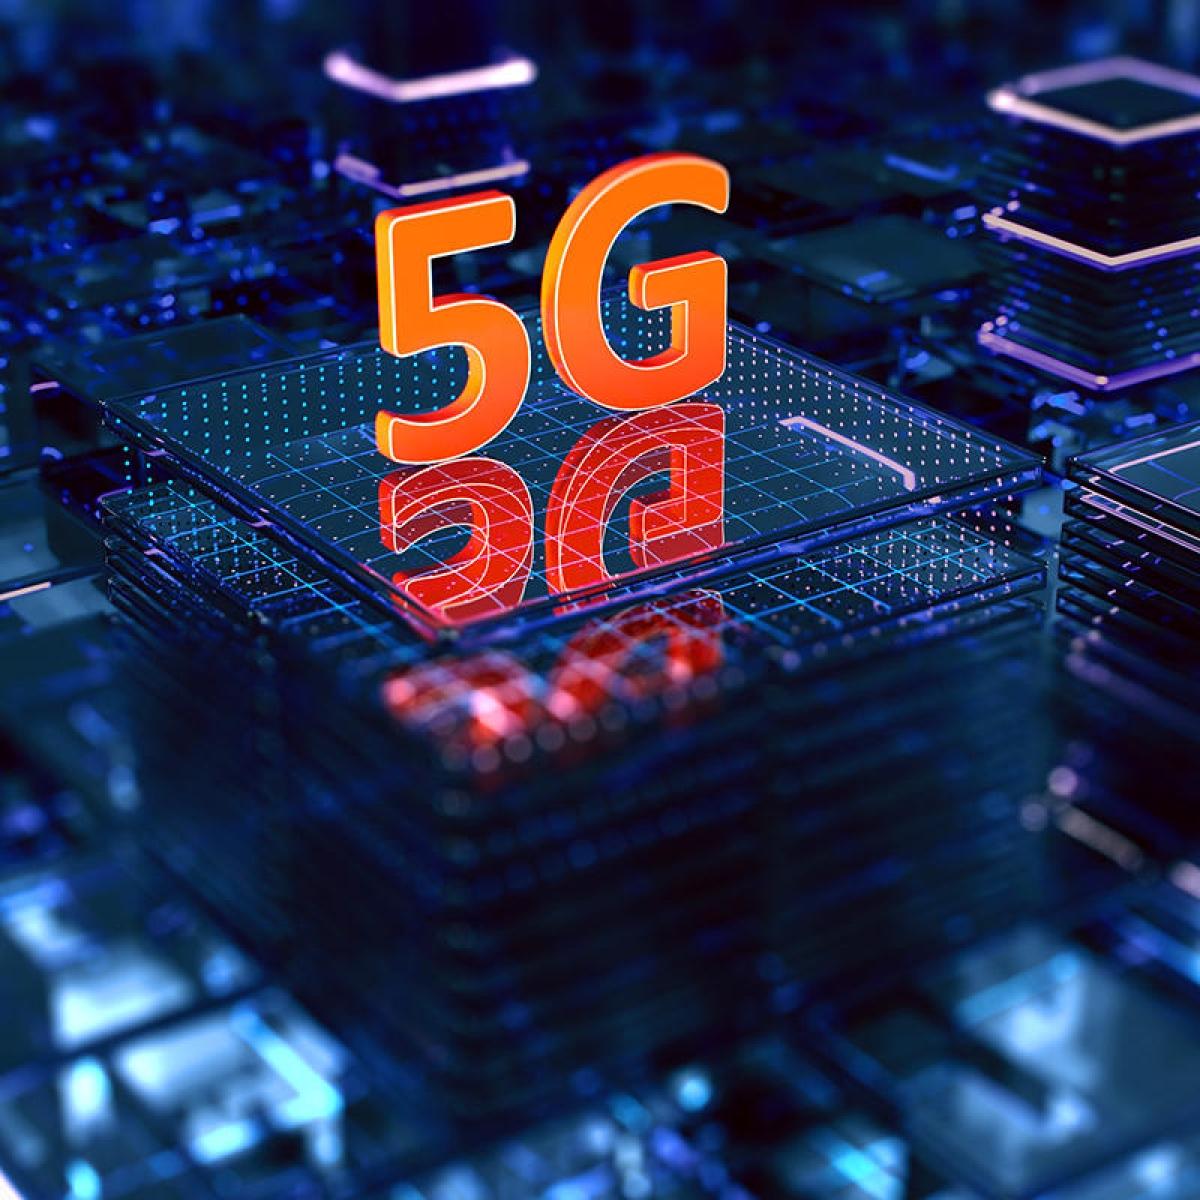 India to take big 5G leap in 2020 but mass adoption far away